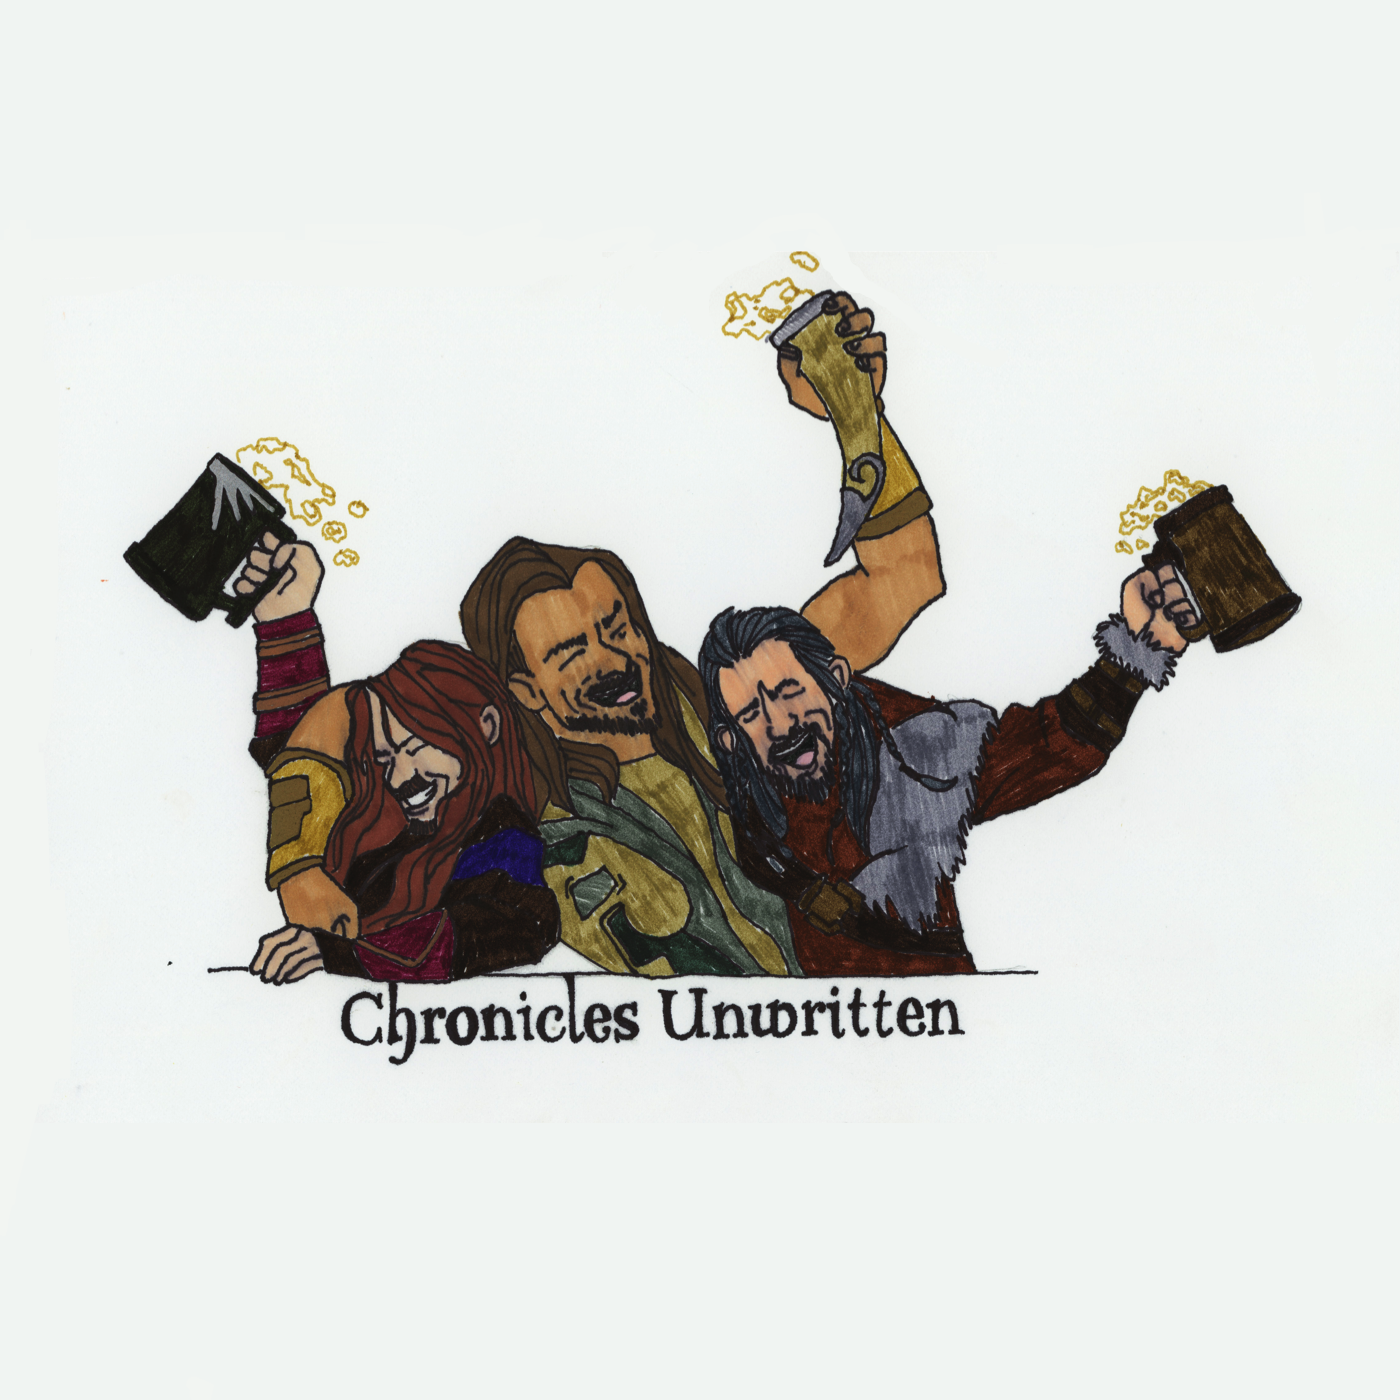 Chronicles Unwritten